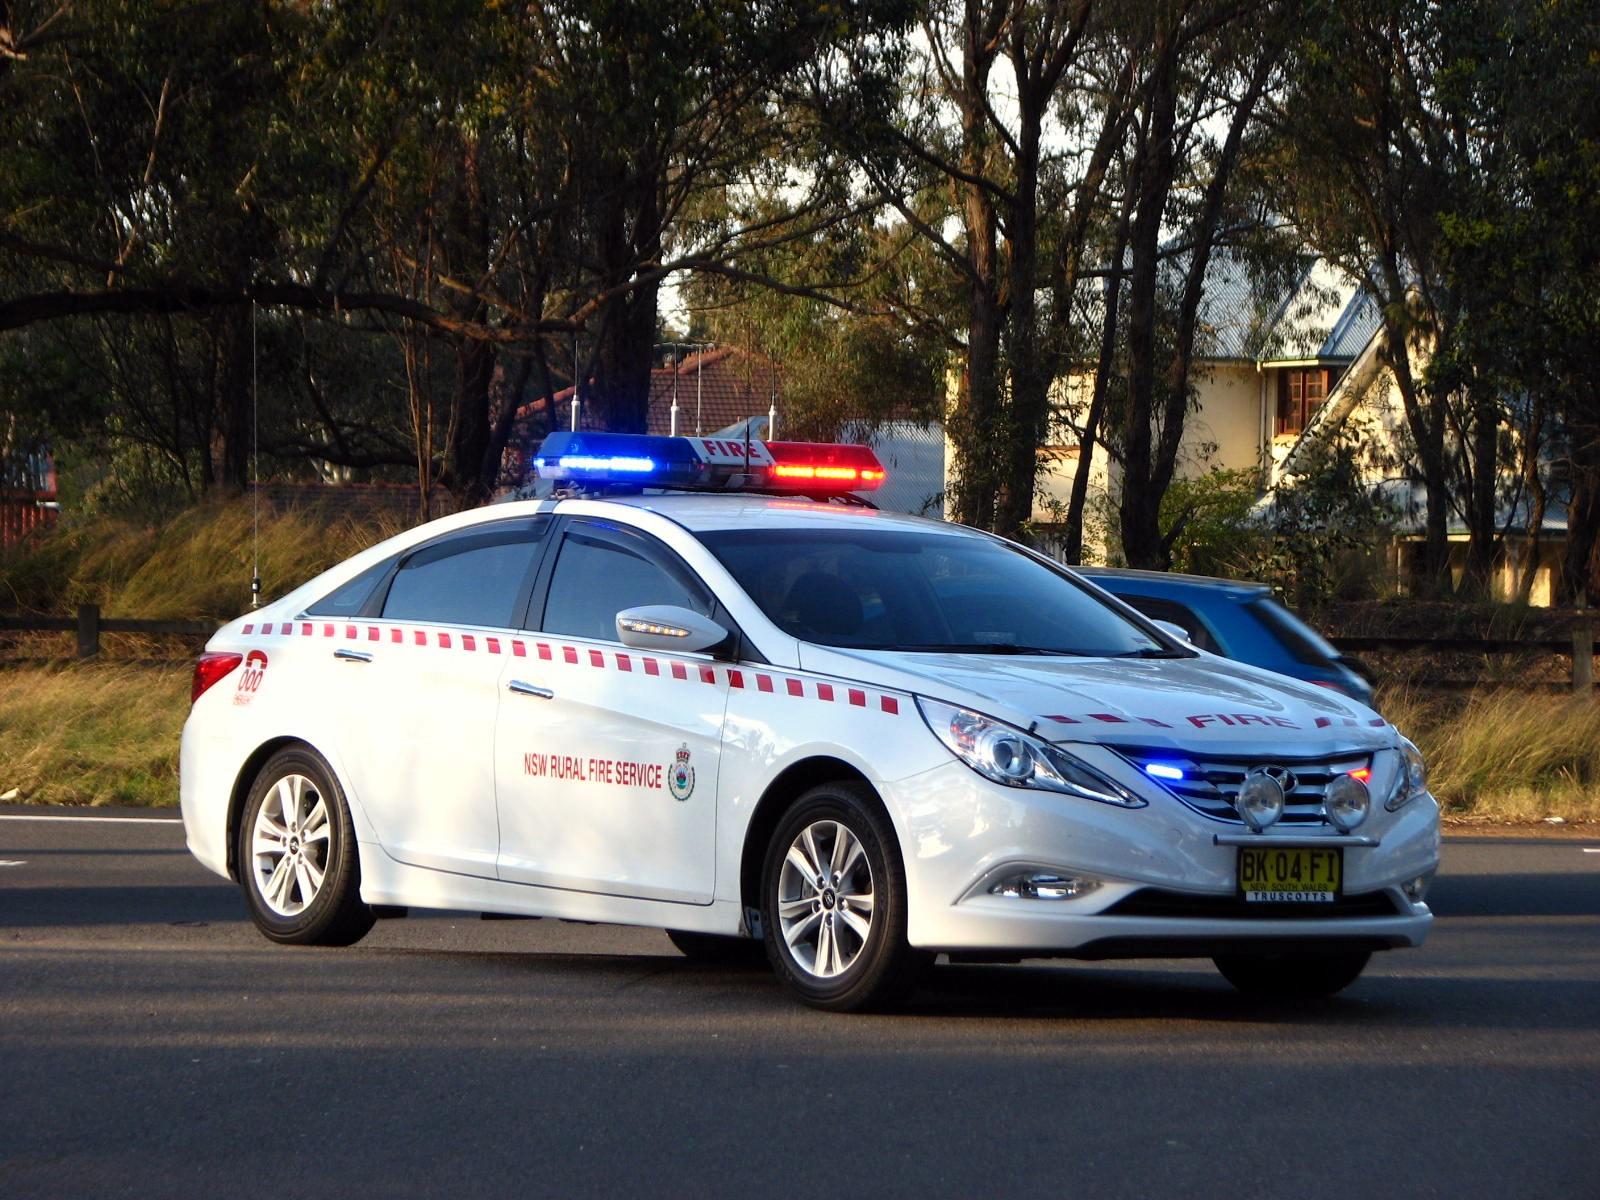 File nswrfs hyundai i45 flickr highway patrol images jpg